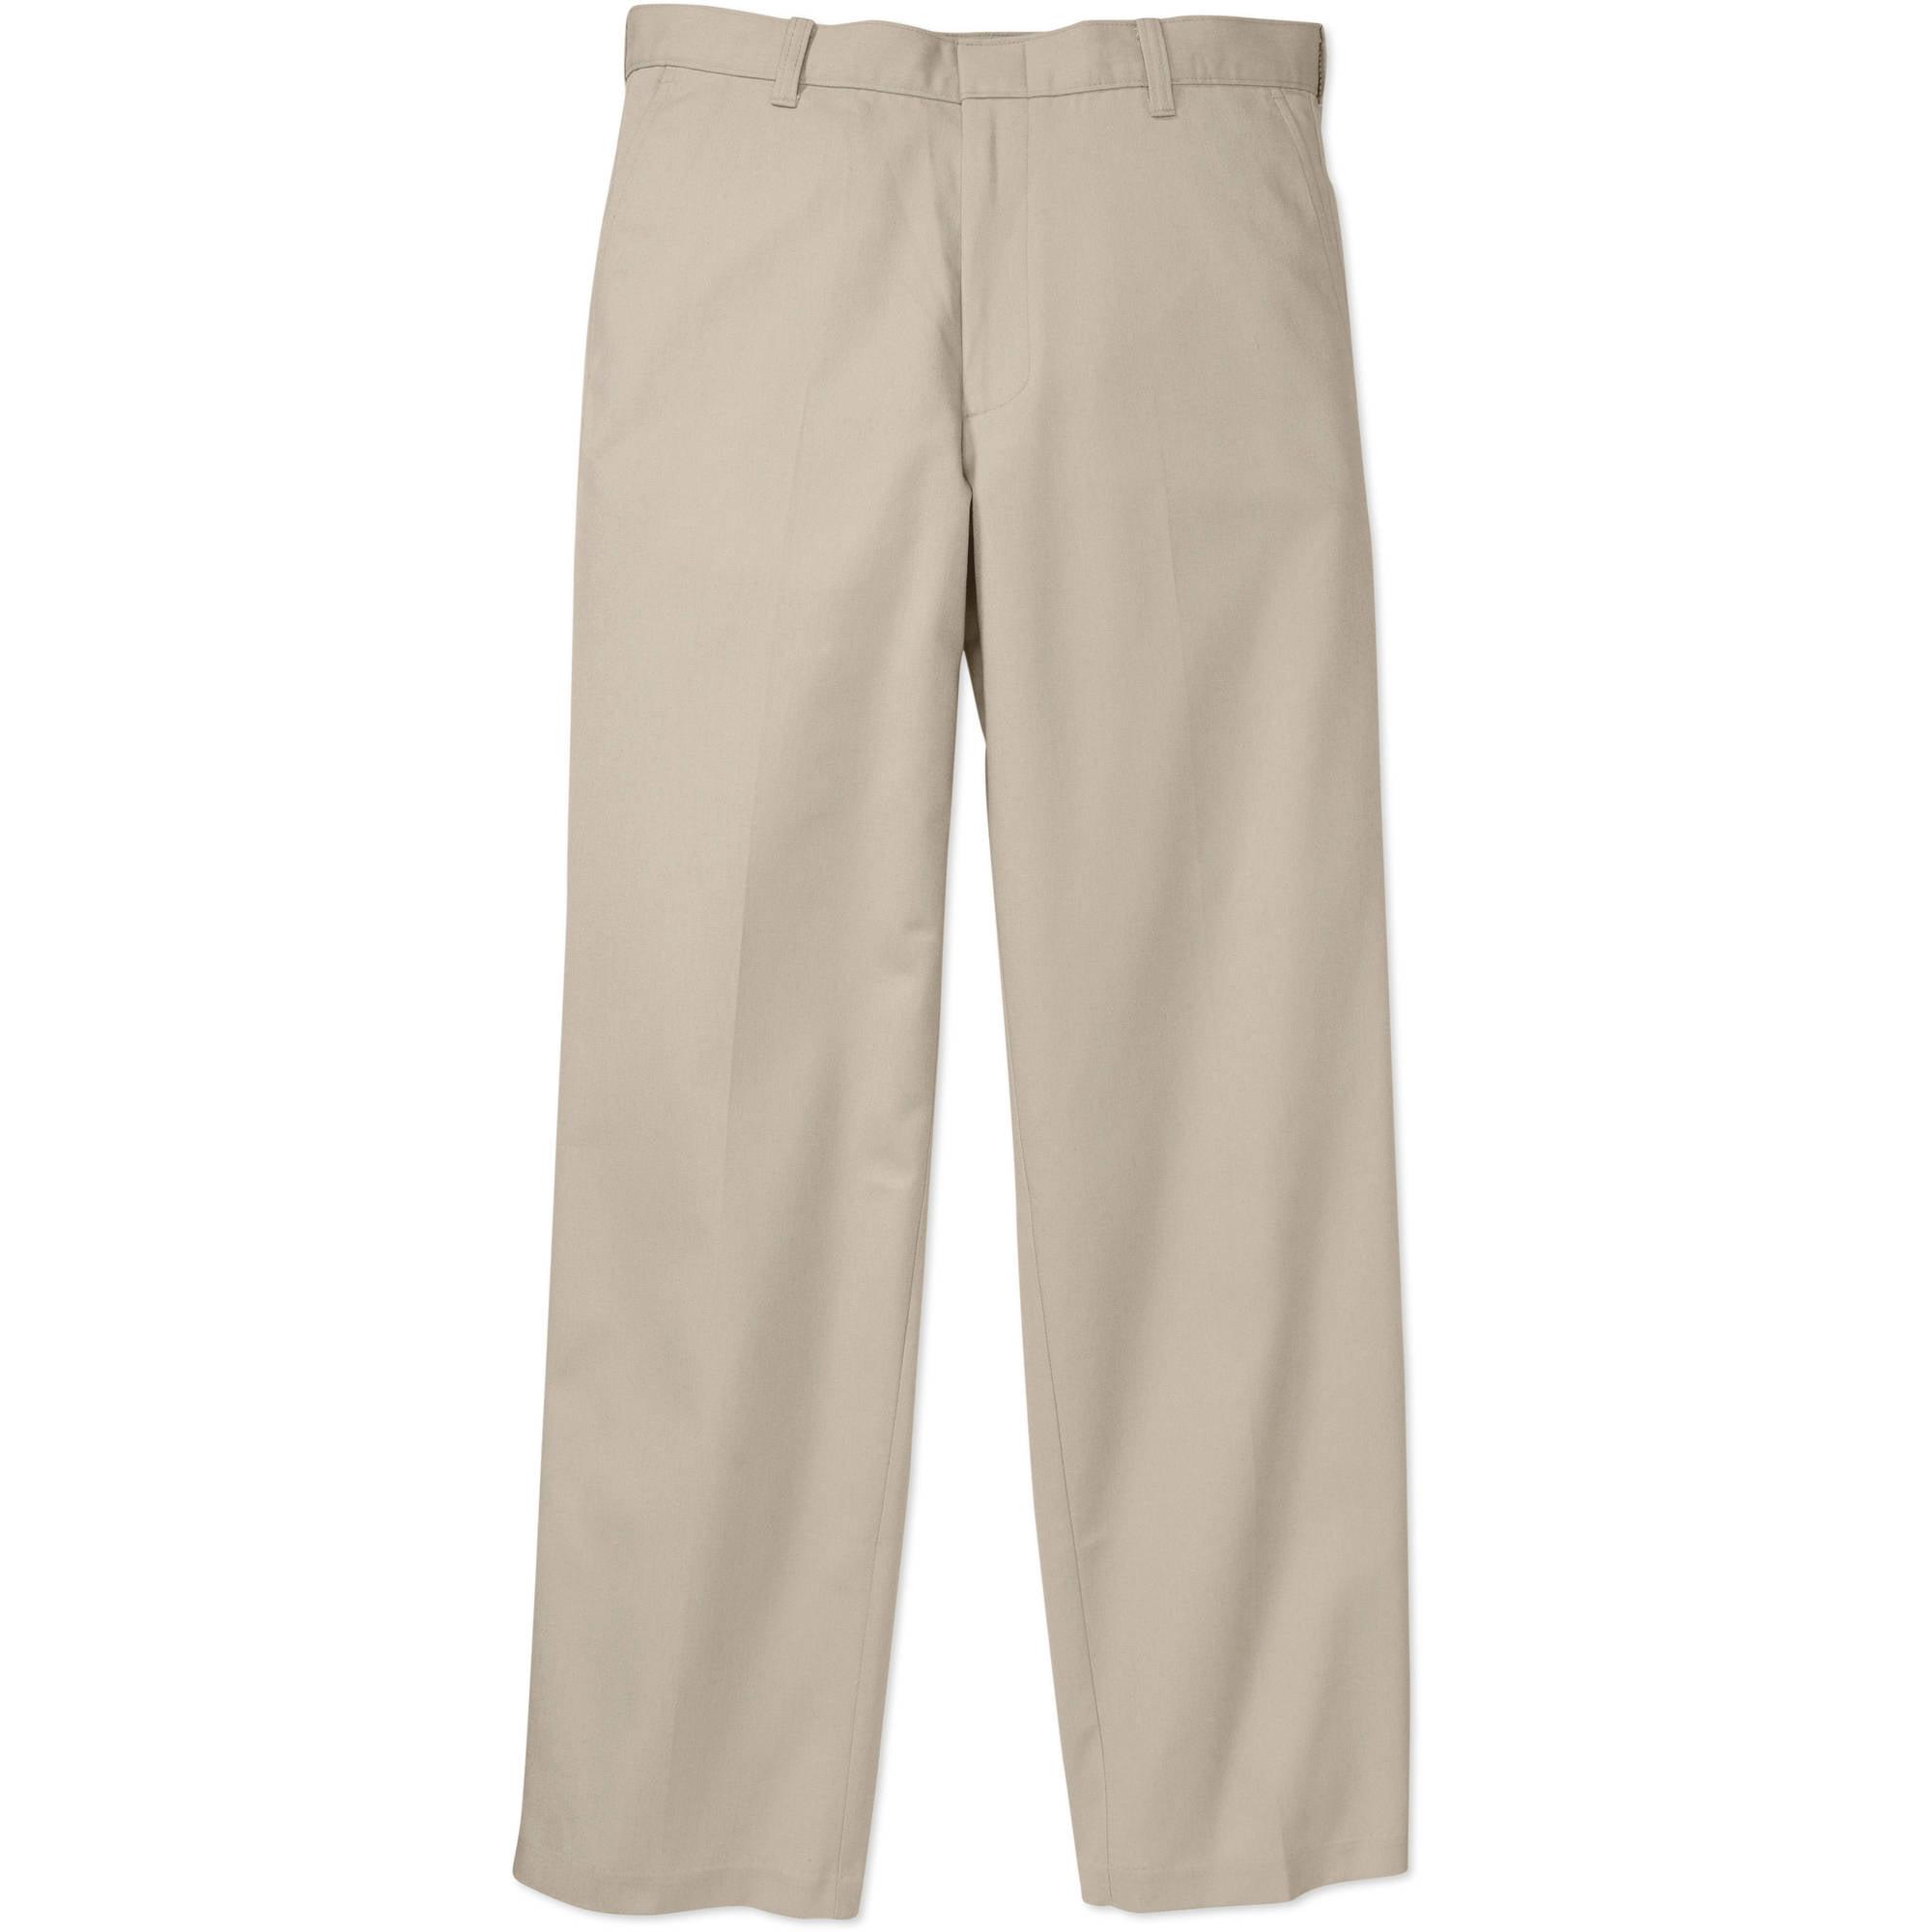 George Big Men's Flat Front Pant